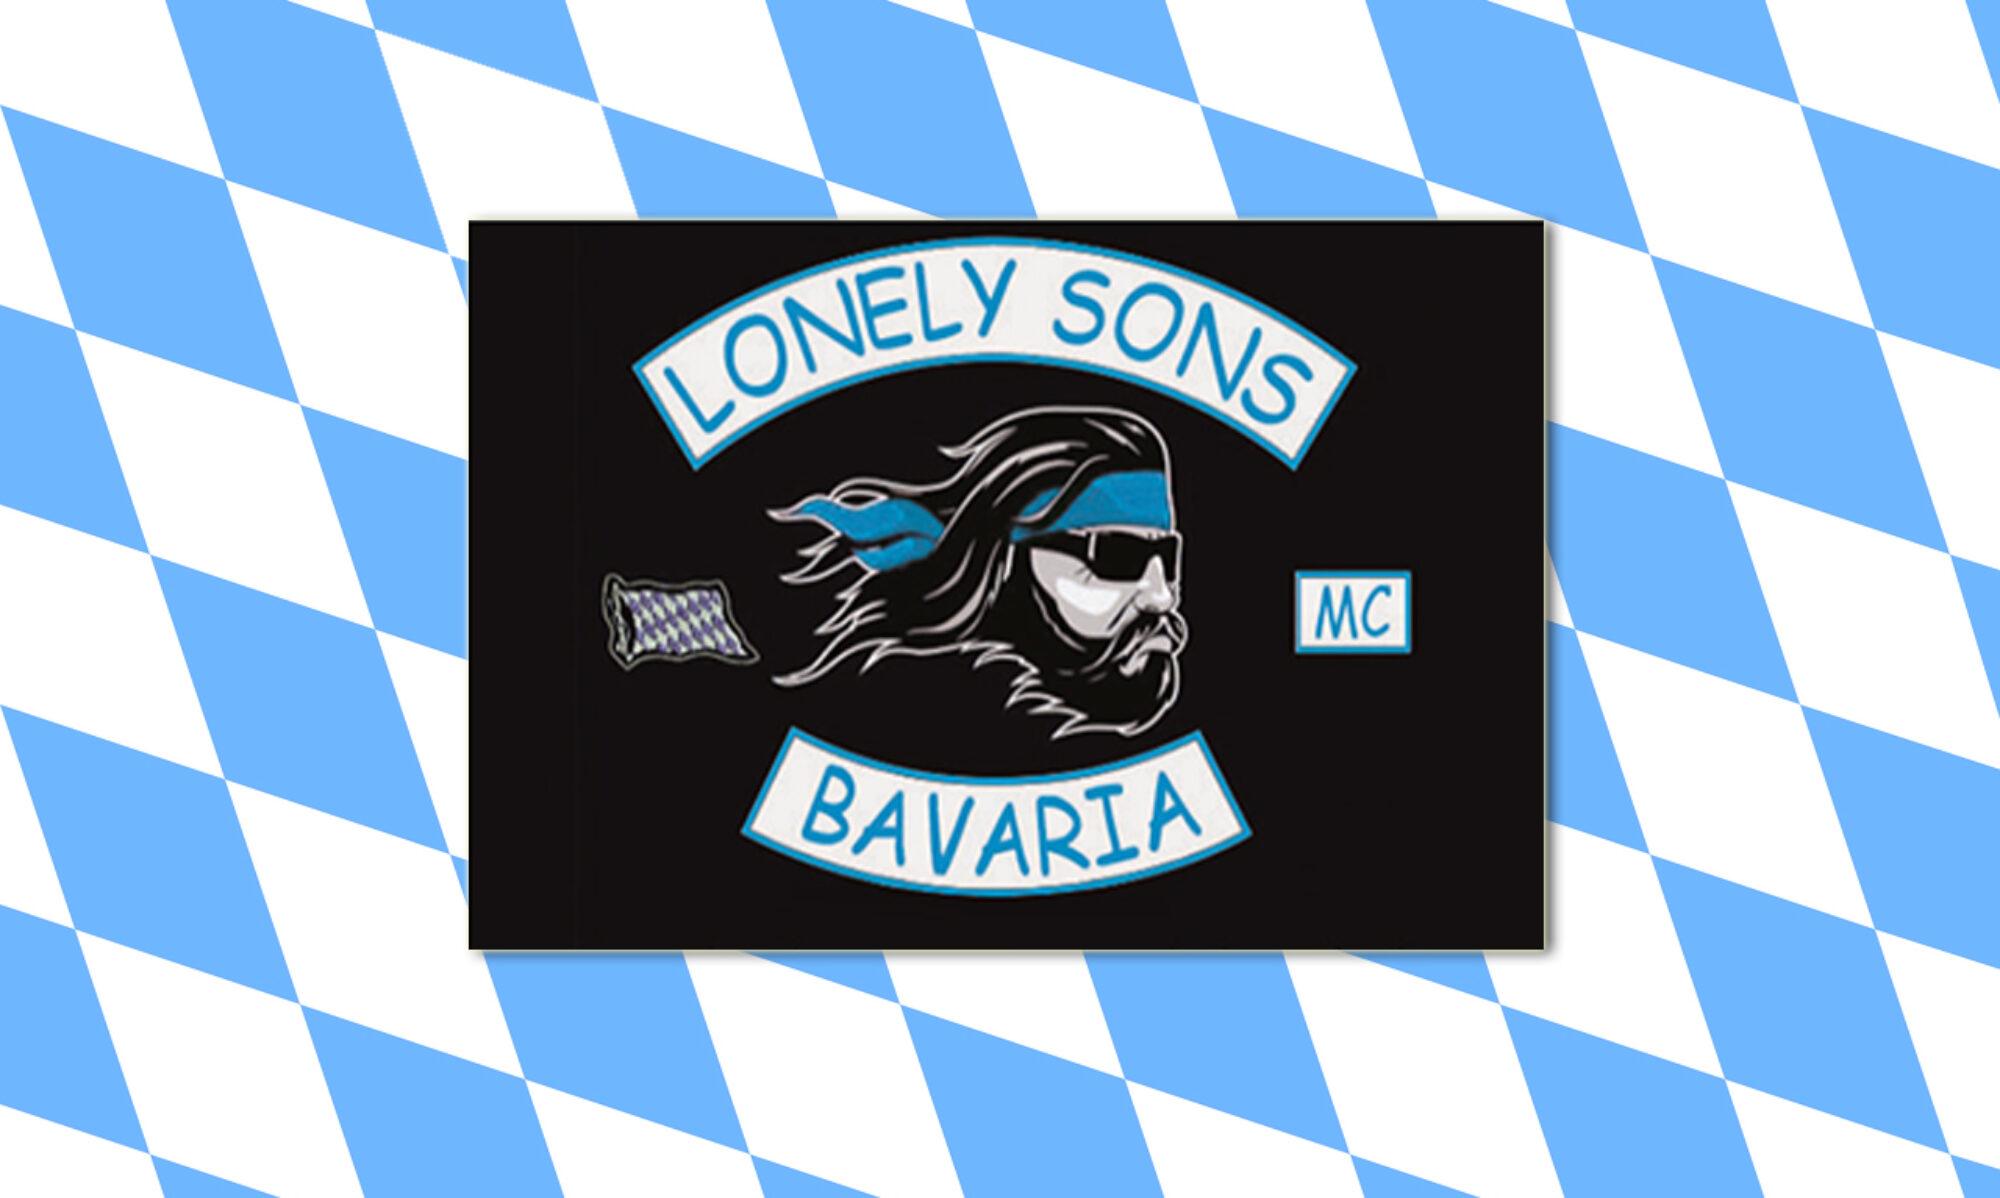 Lonely Sons MC Nomads Bavaria